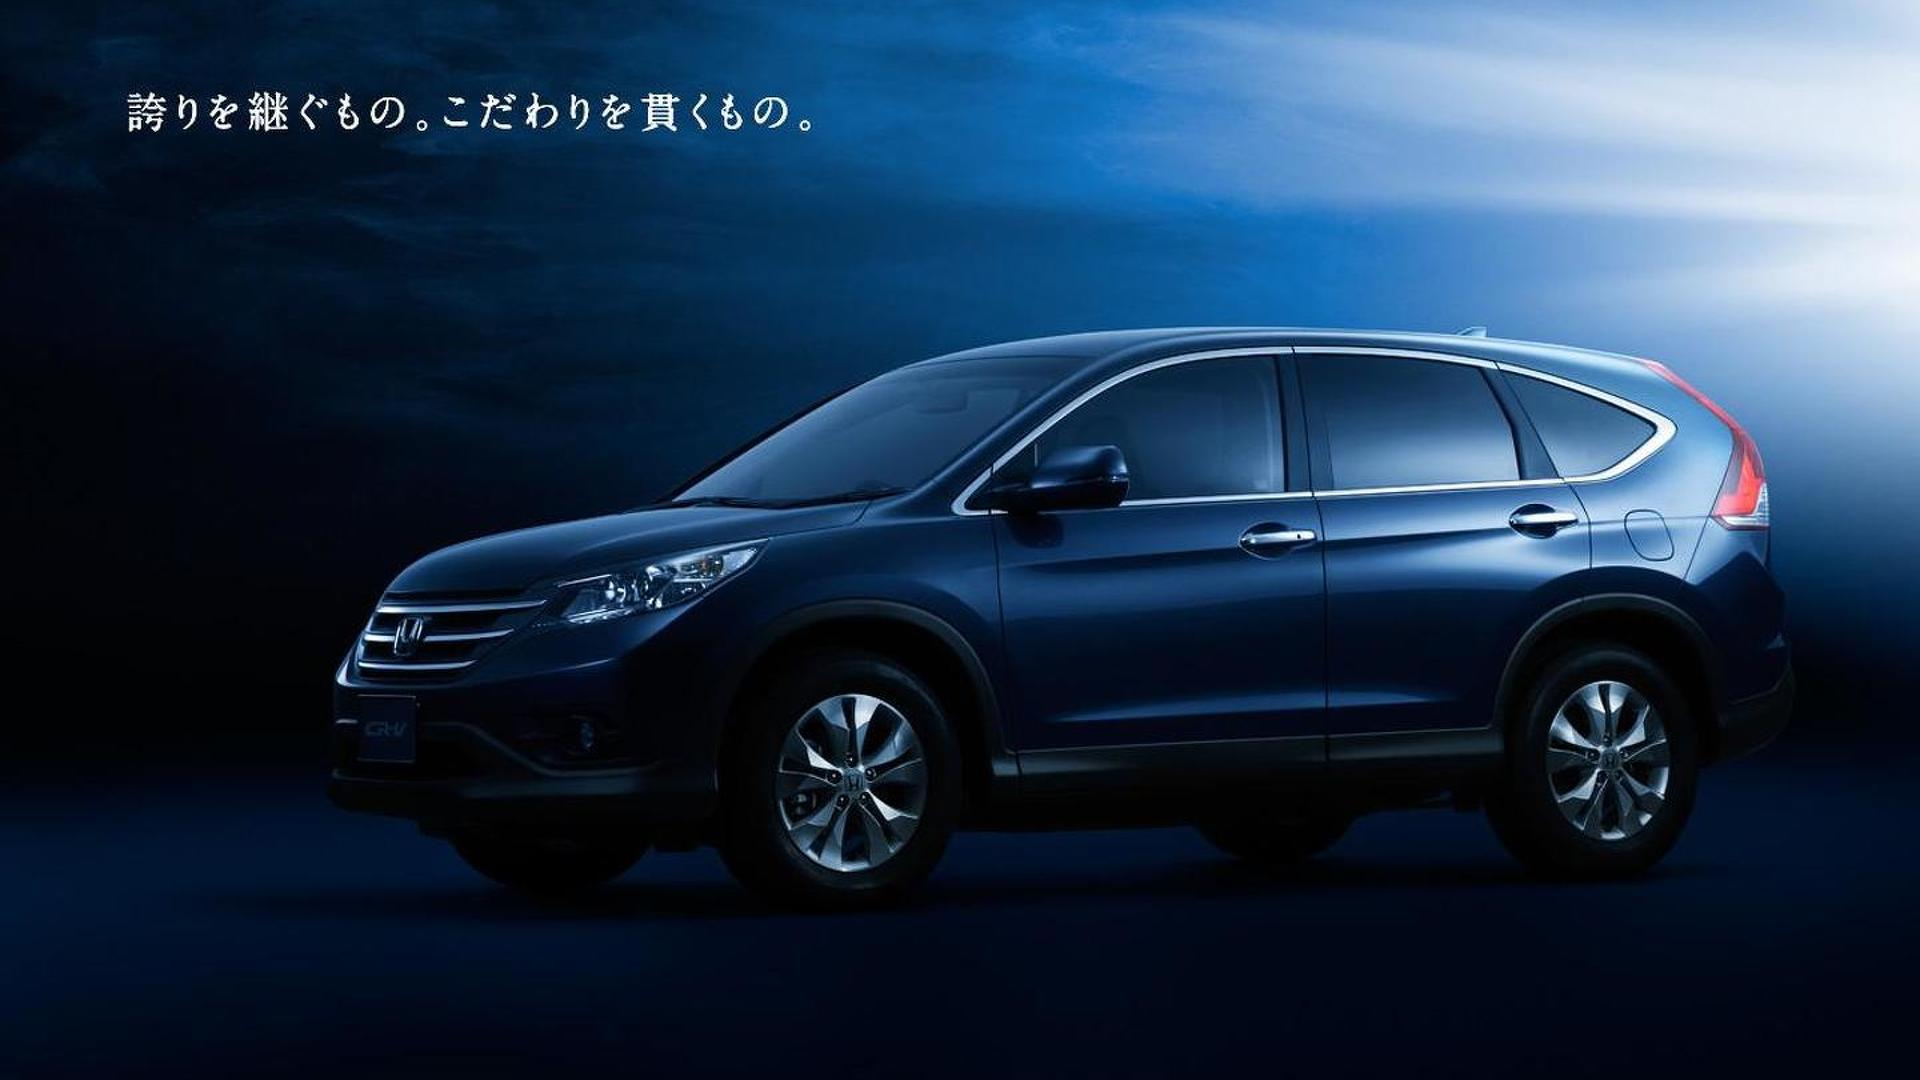 2012 Honda CR-V teased ahead of L.A. debut